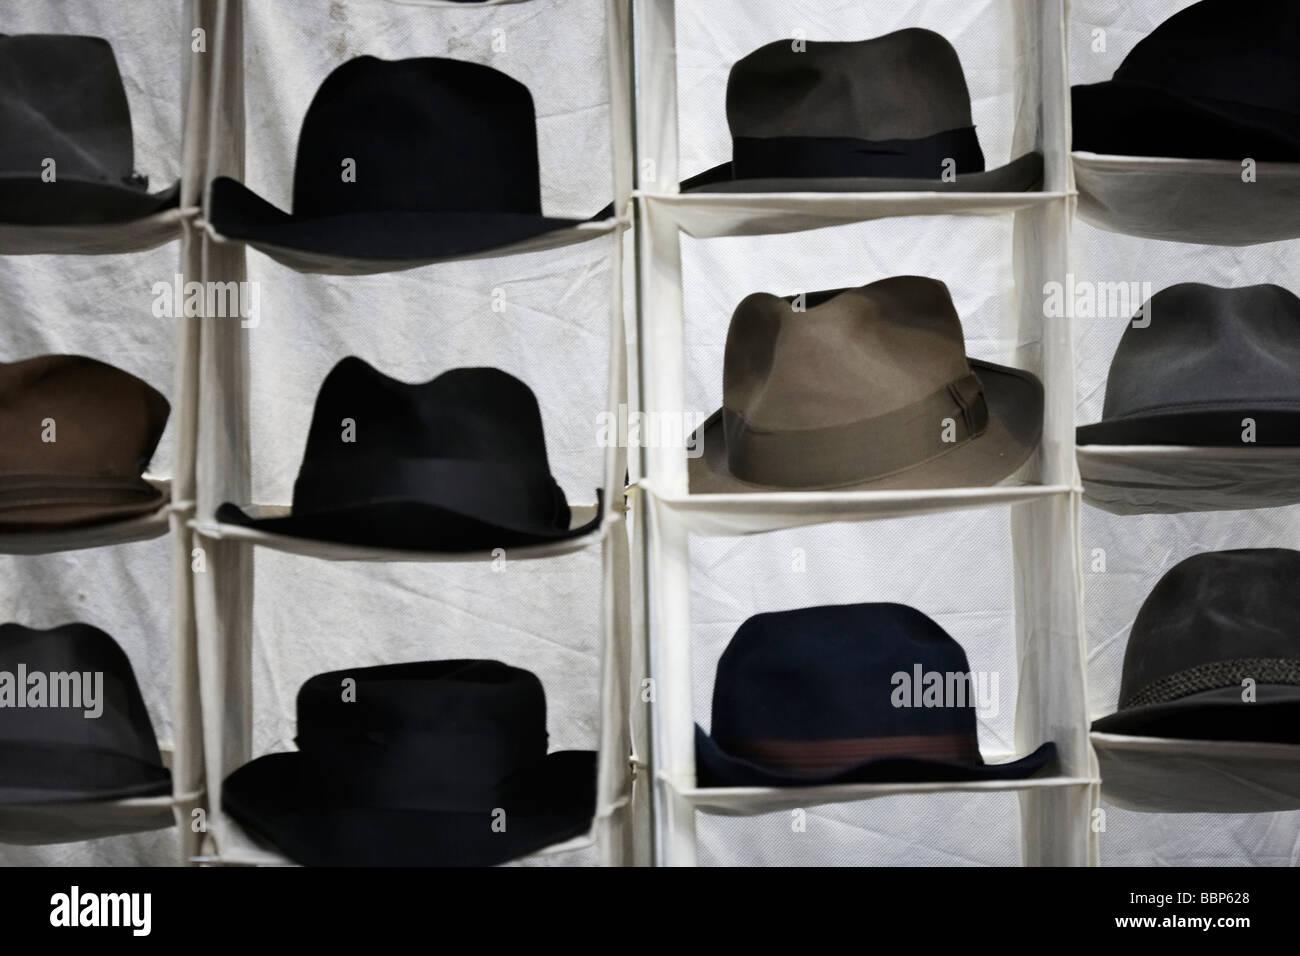 0ea718e69a360c Hats on display, on a market stall Stock Photo: 24459296 - Alamy